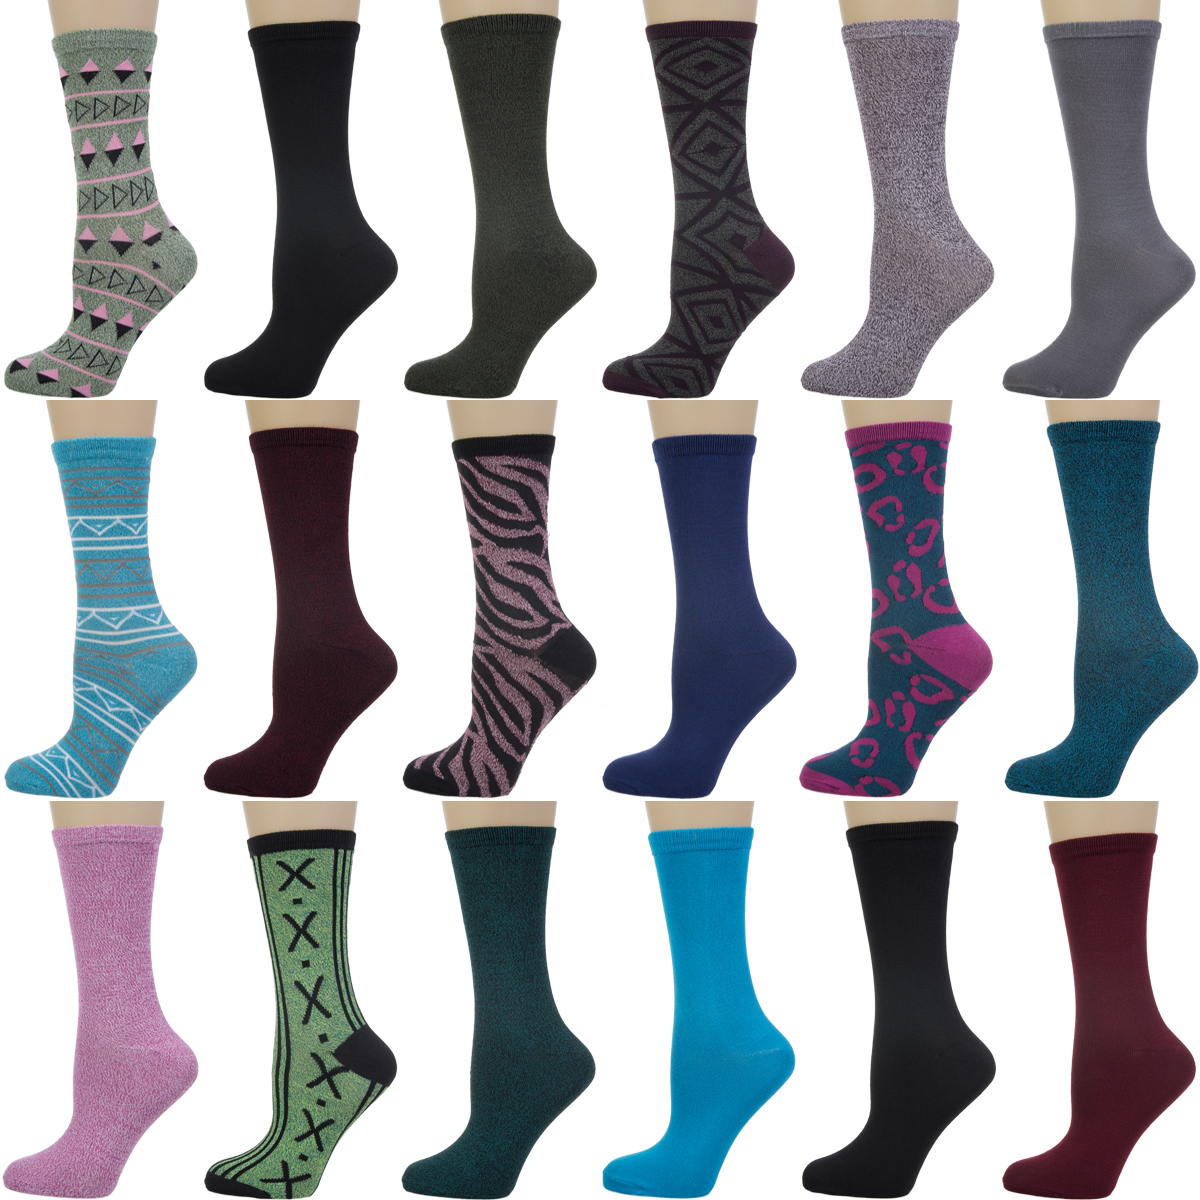 18 Pairs Nicole Miller Women Pattern Print Solid Crew Dress Casual Ladies Socks